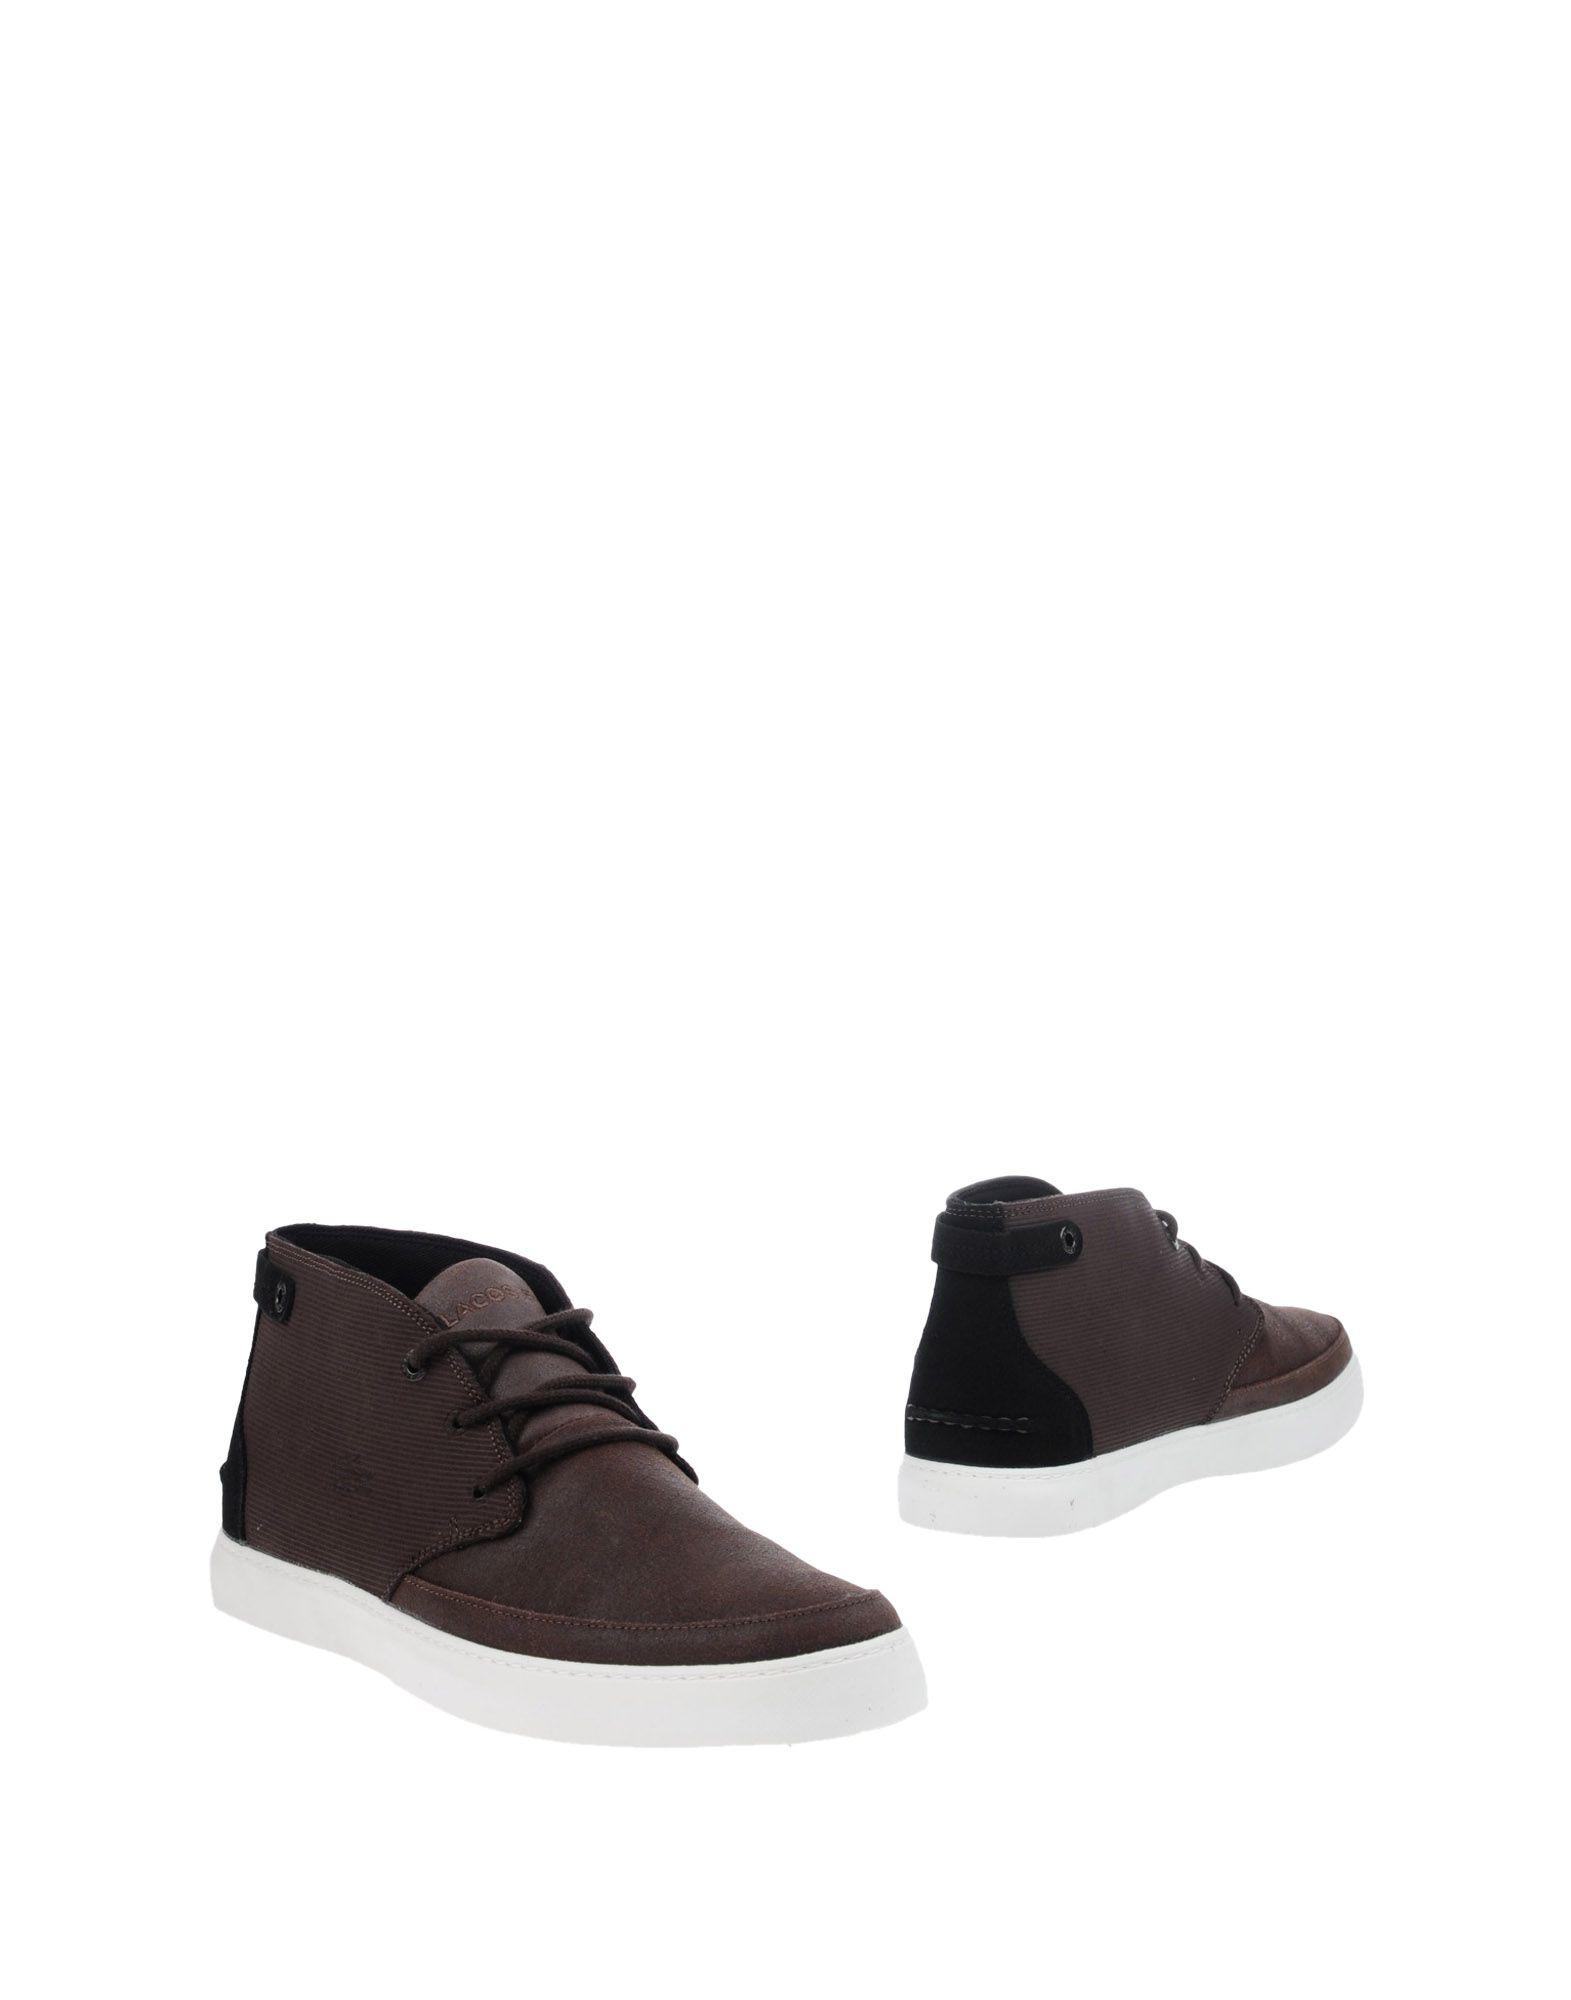 LACOSTE Полусапоги и высокие ботинки демисезонные ботинки lacoste 29srm2120 1190